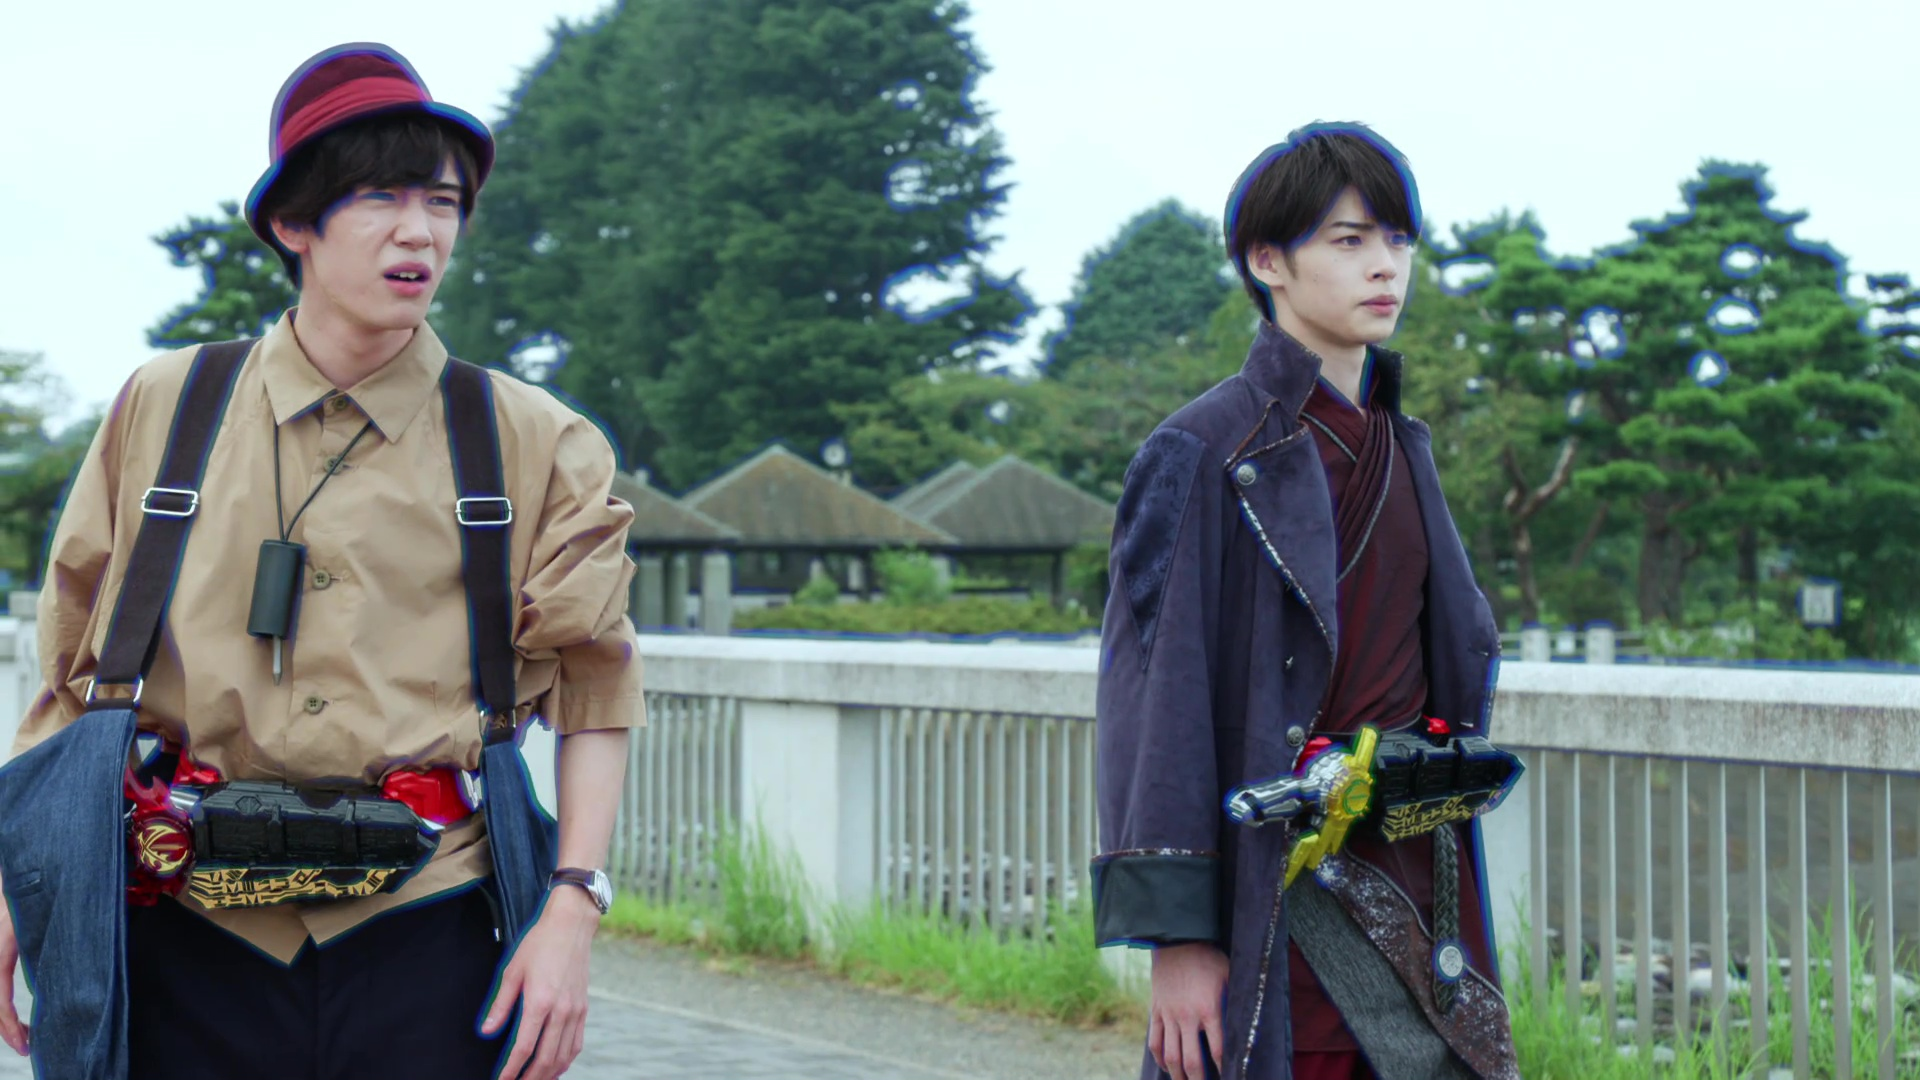 Kamen Rider Saber Episode 5 Recap